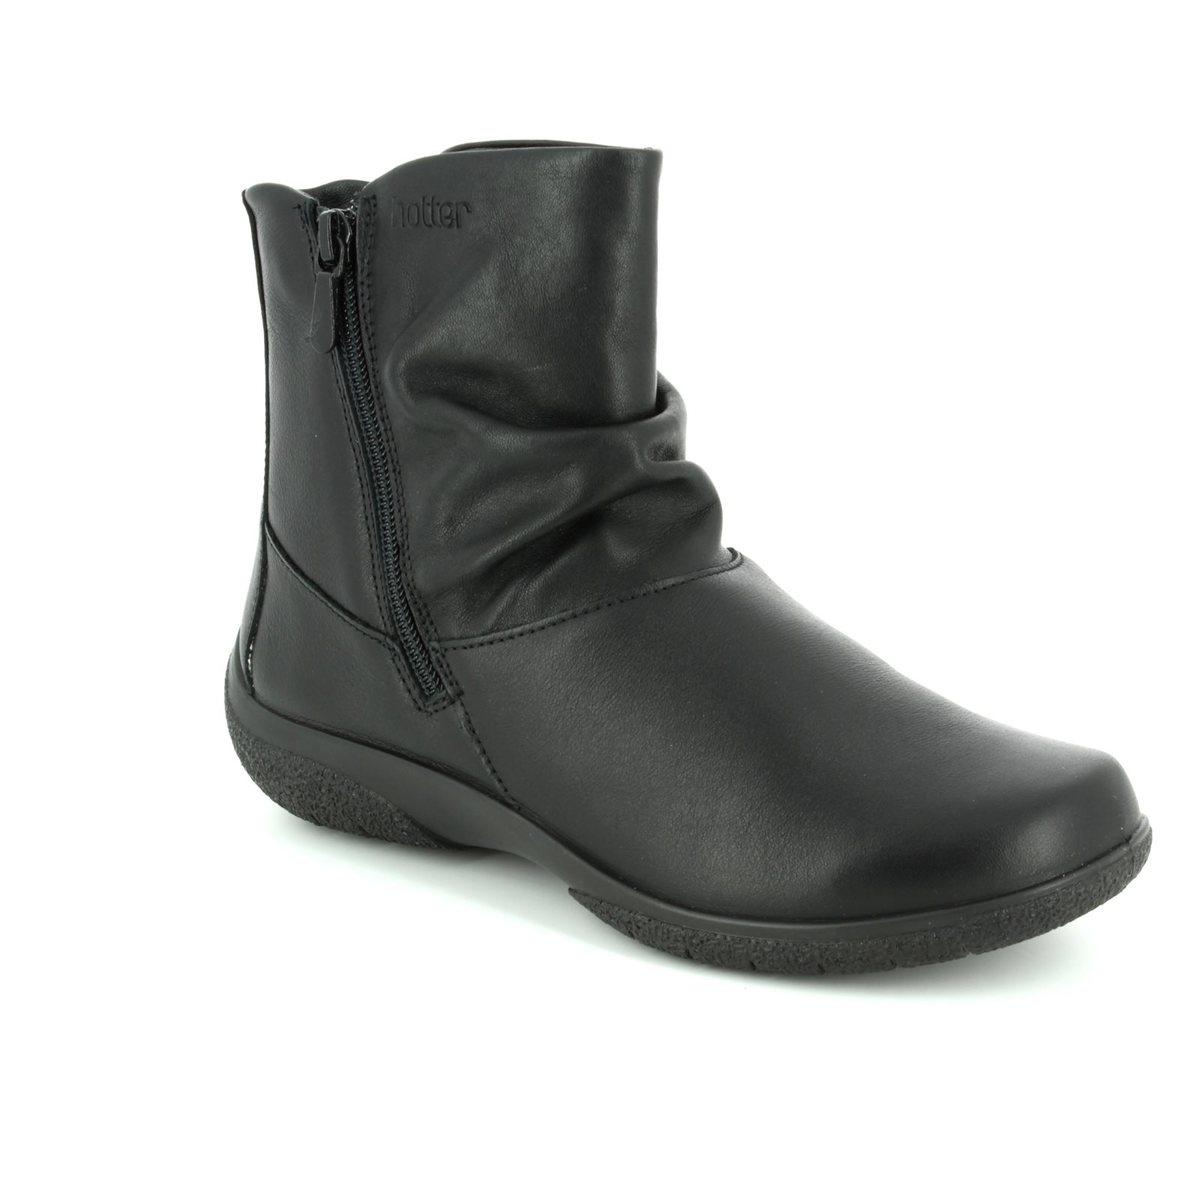 Hotter Whisper 7205-30 Black ankle boots